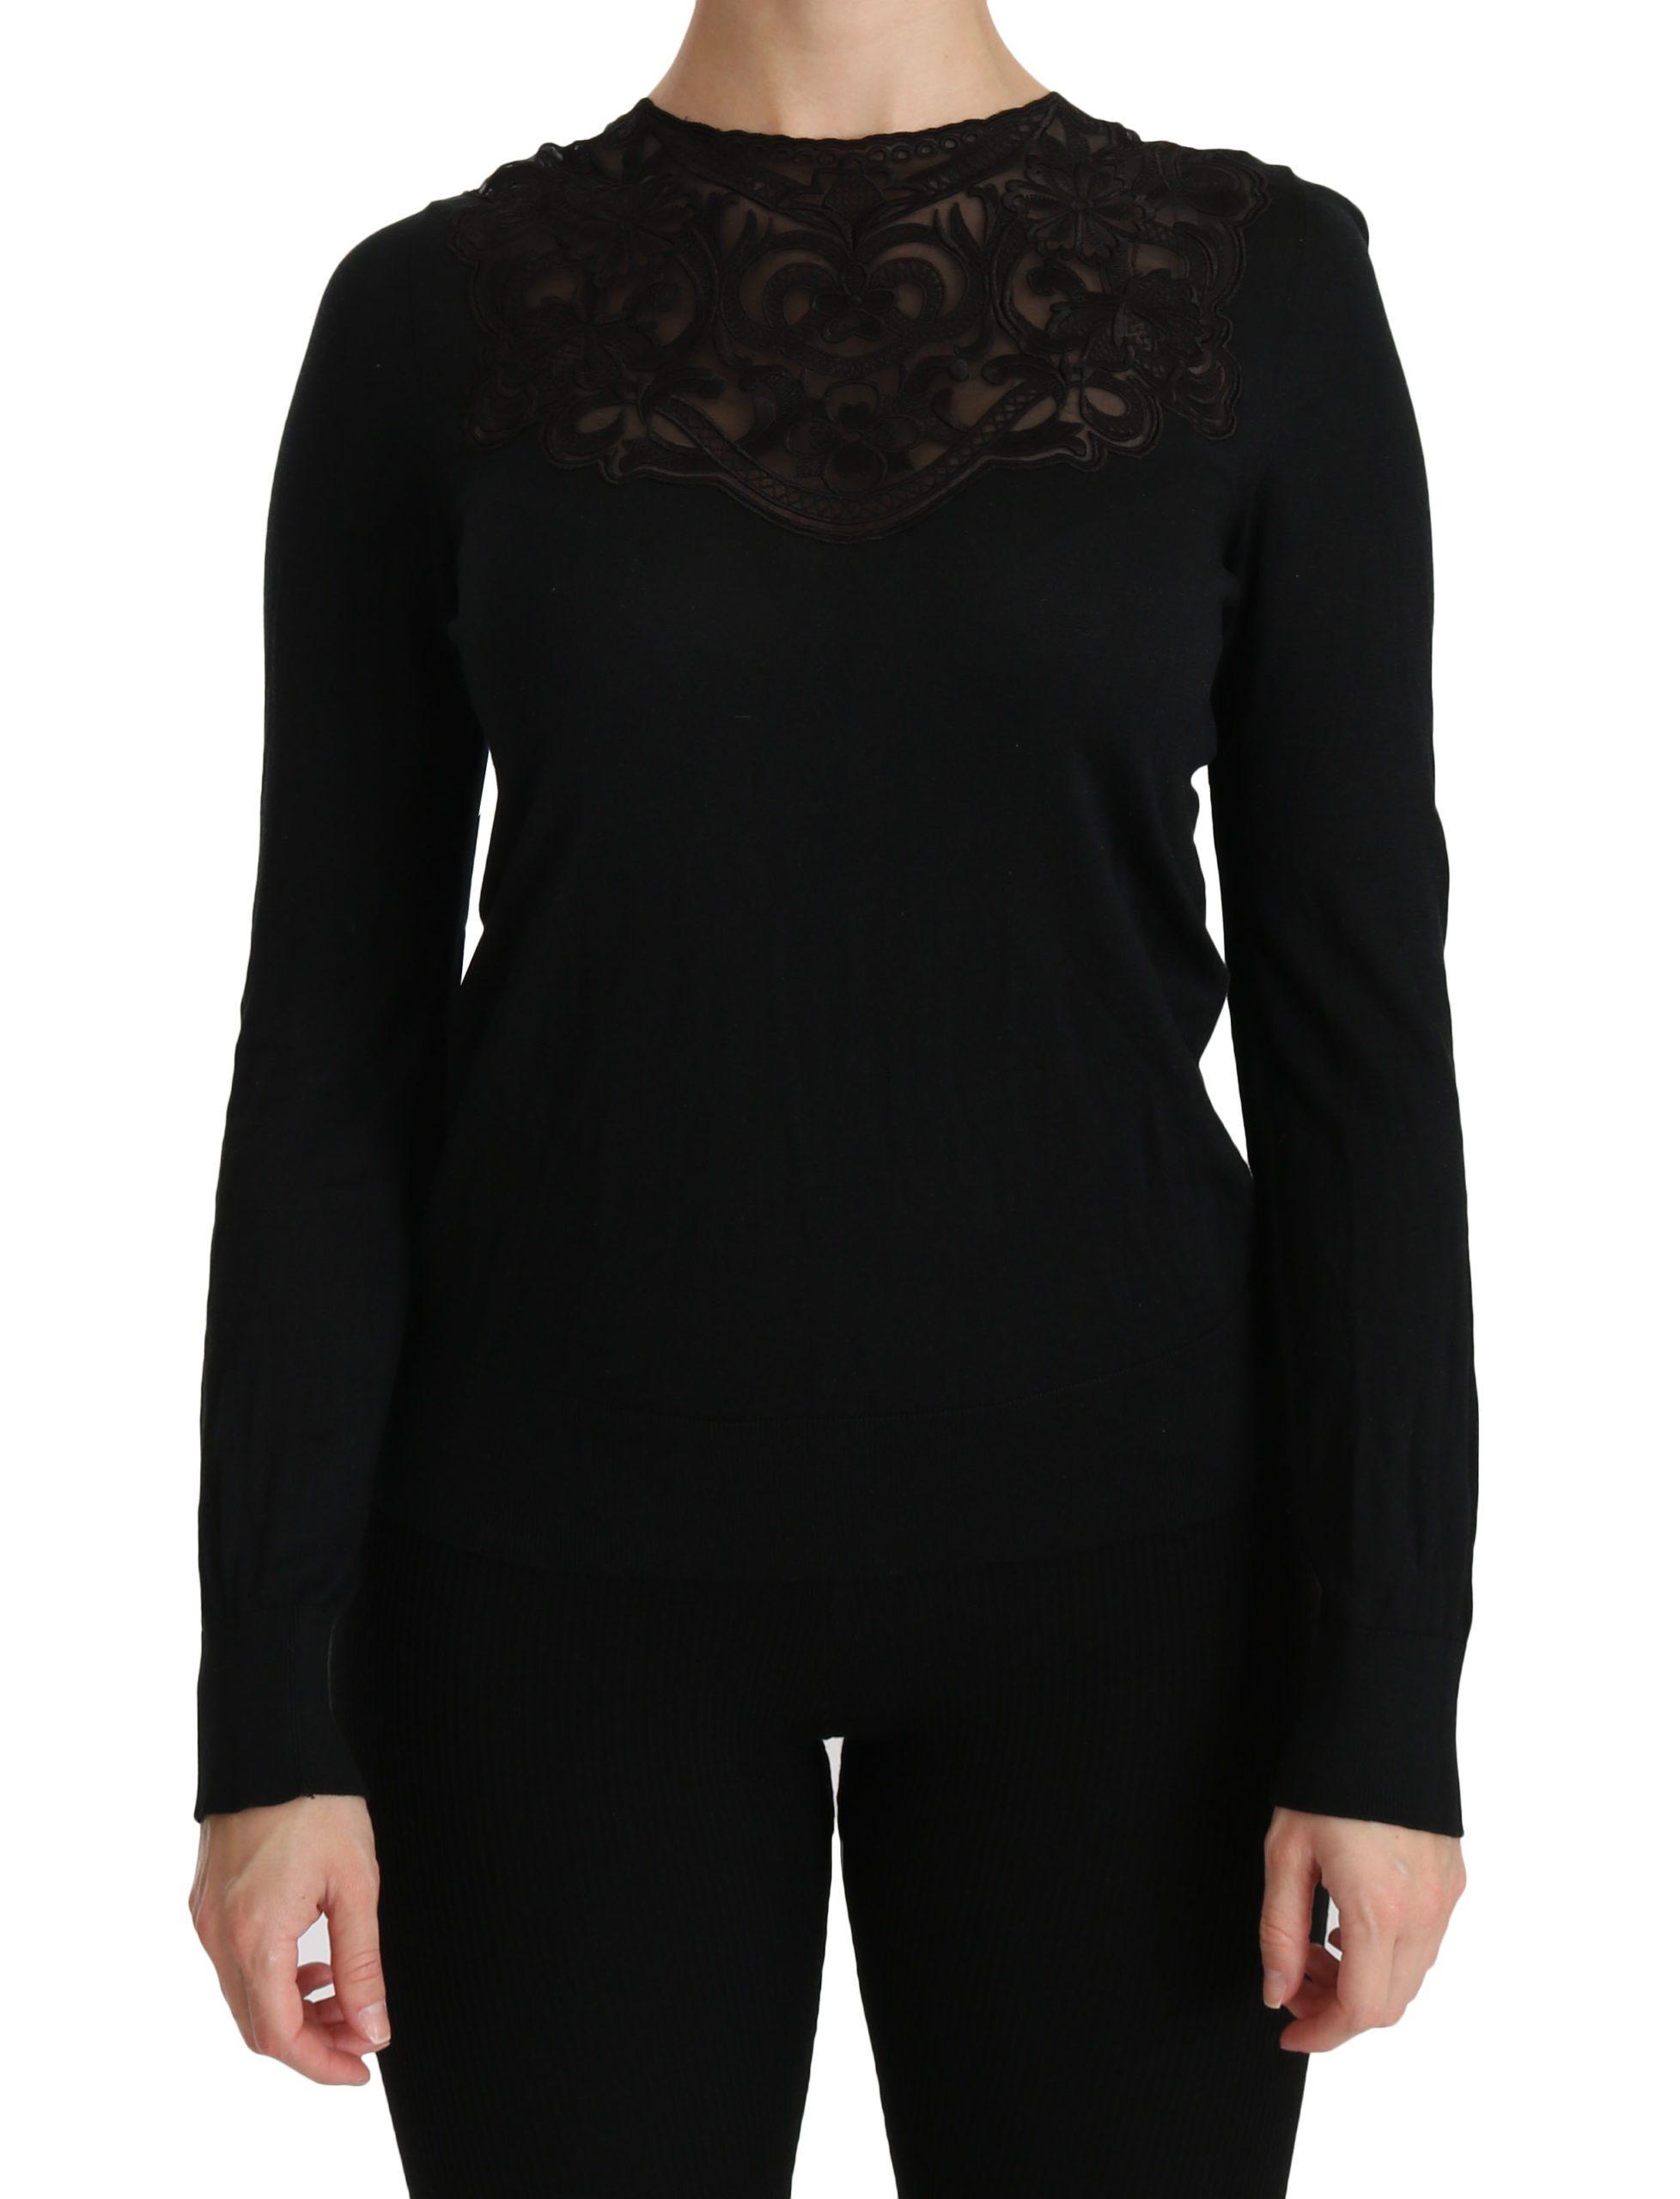 Black Silk Lace Crew Neck Long Sleeve Blouse - IT40 S